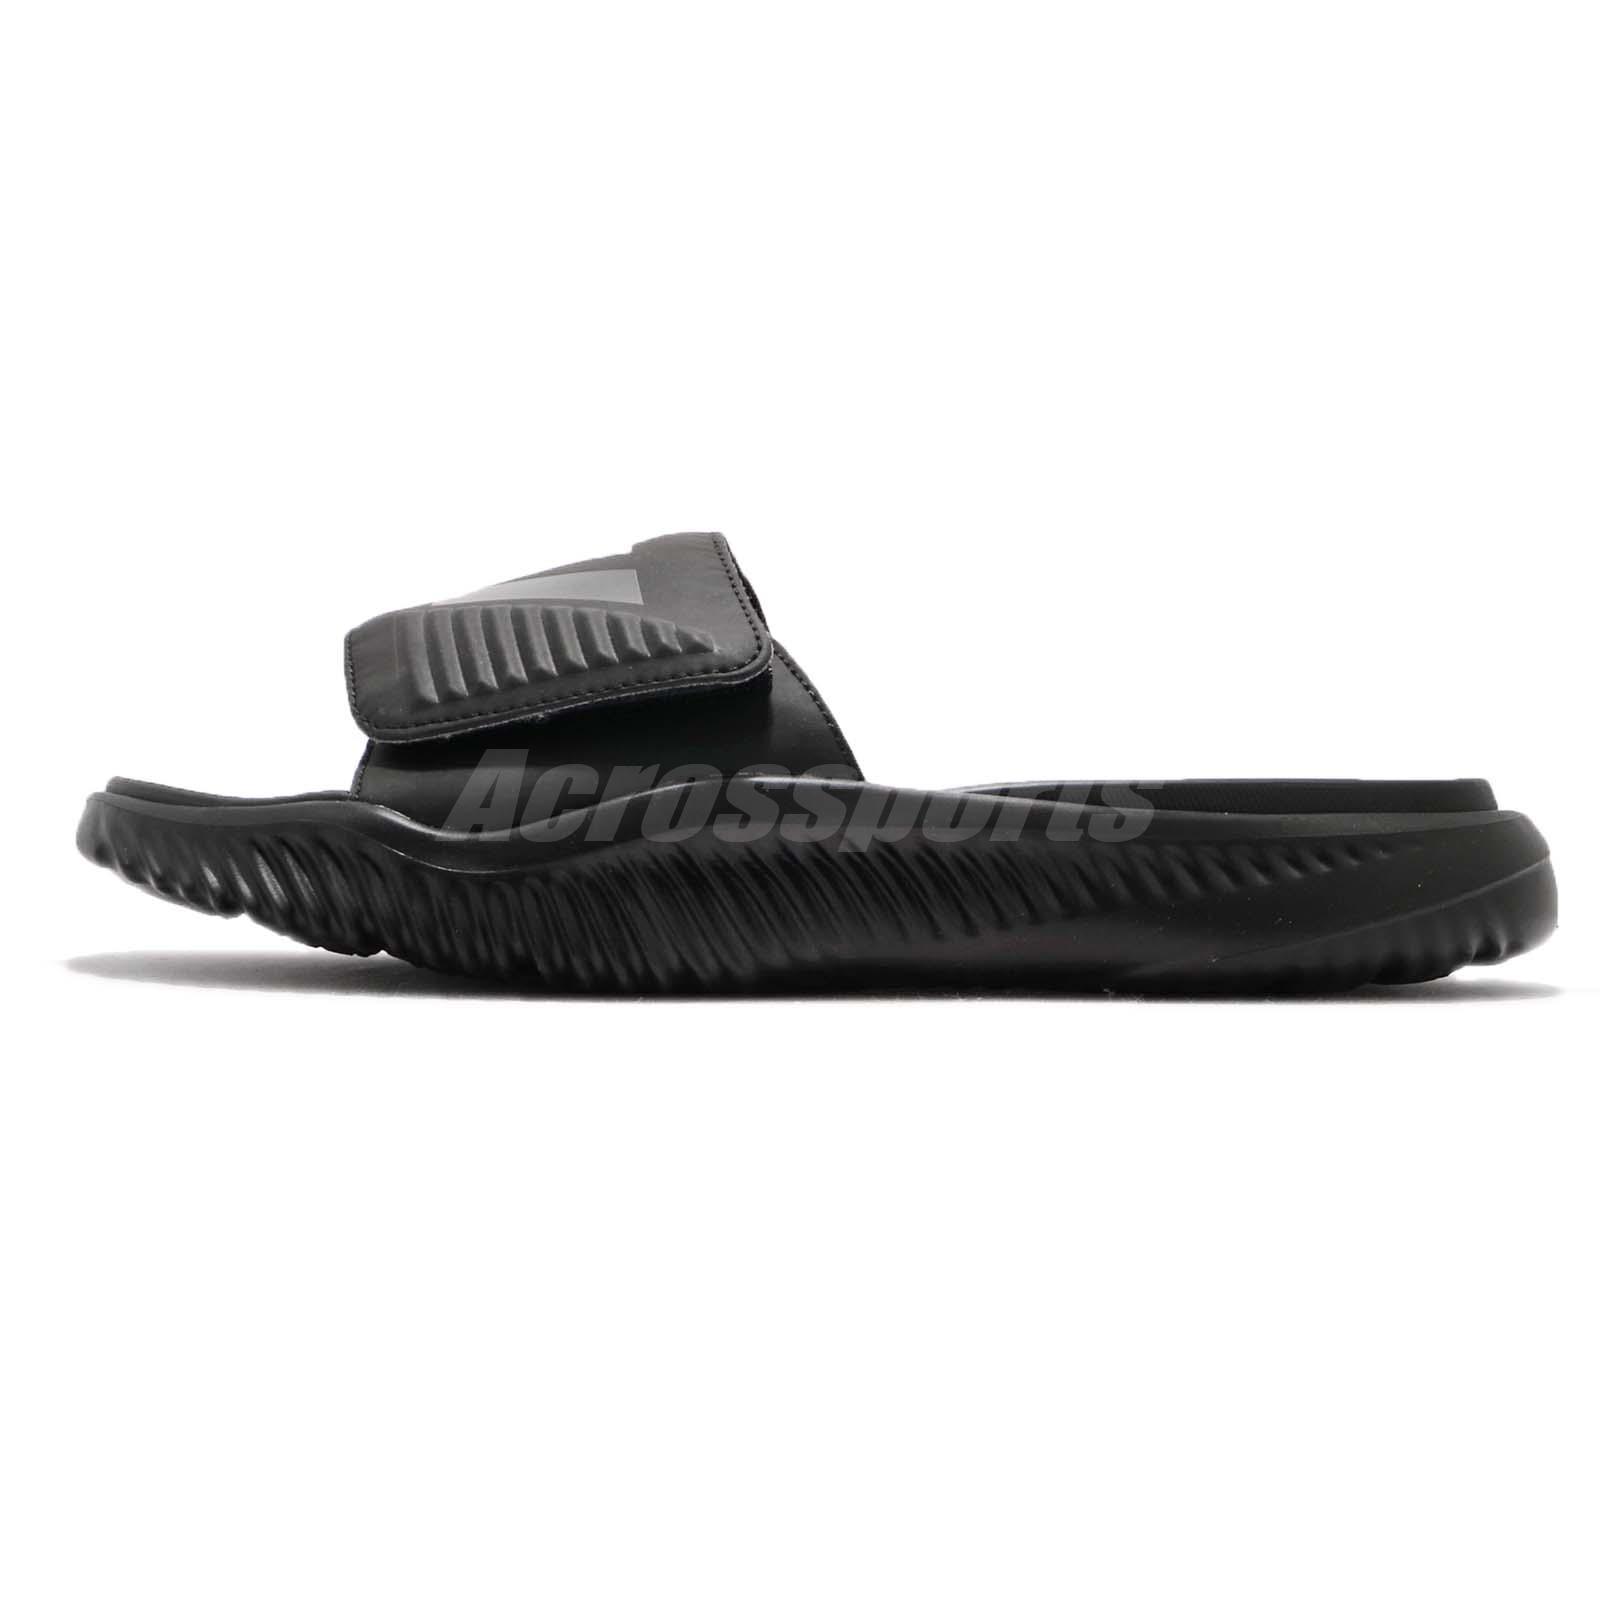 a20ef09d5 adidas AlphaBounce Slide Triple Black Men Sports Sandals Slippers ...